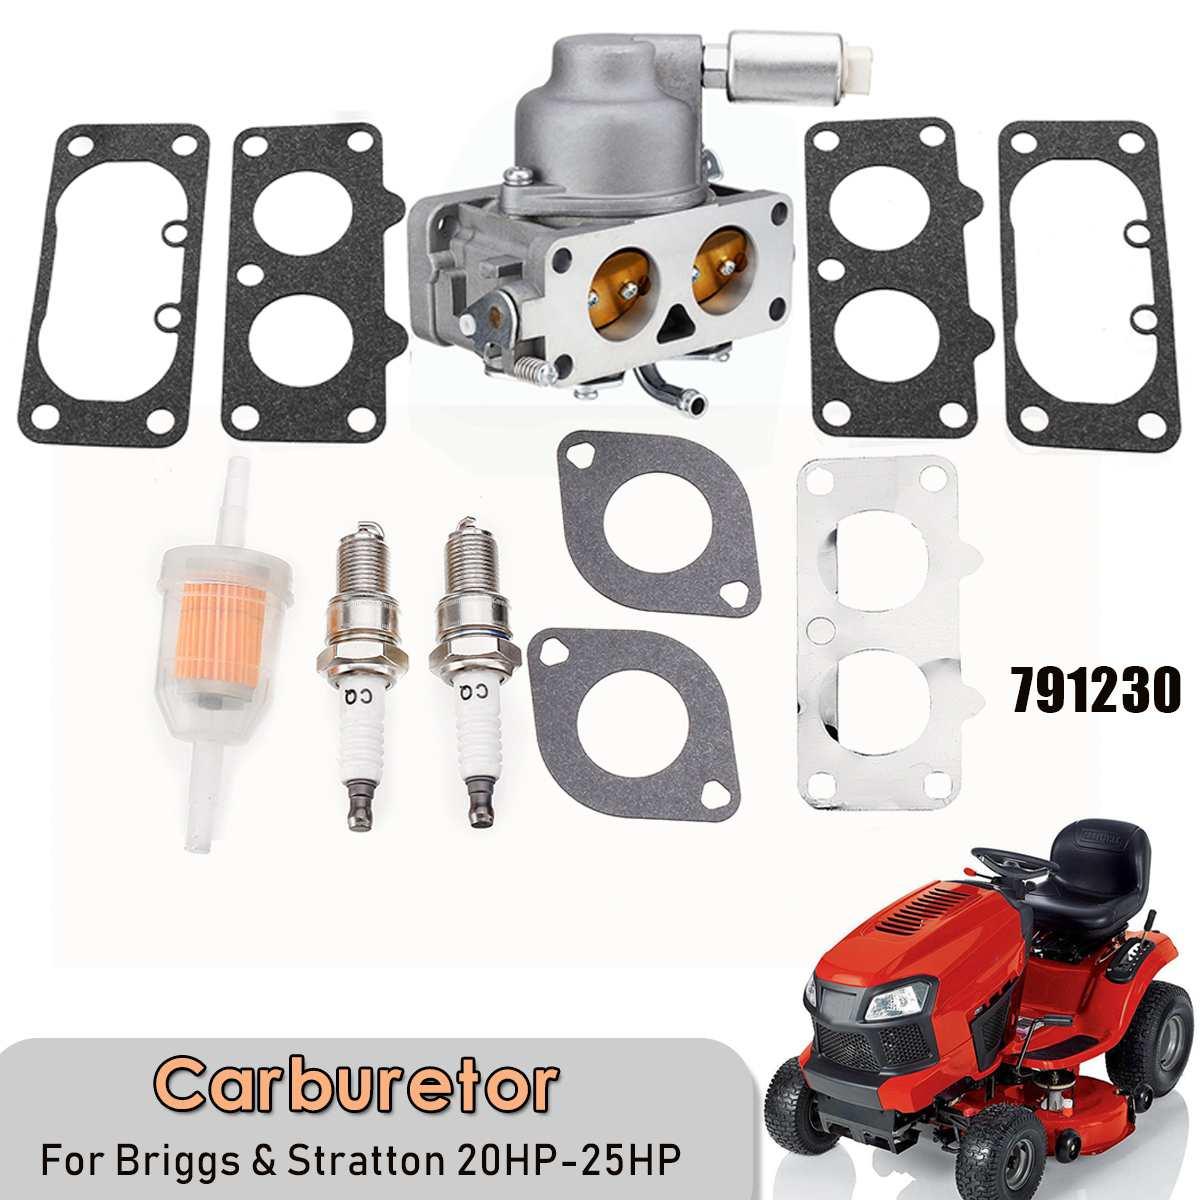 Kit d'outils carburateur pour Briggs et Stratton 20HP-25HP Intek v-twin Engine Carb 791230